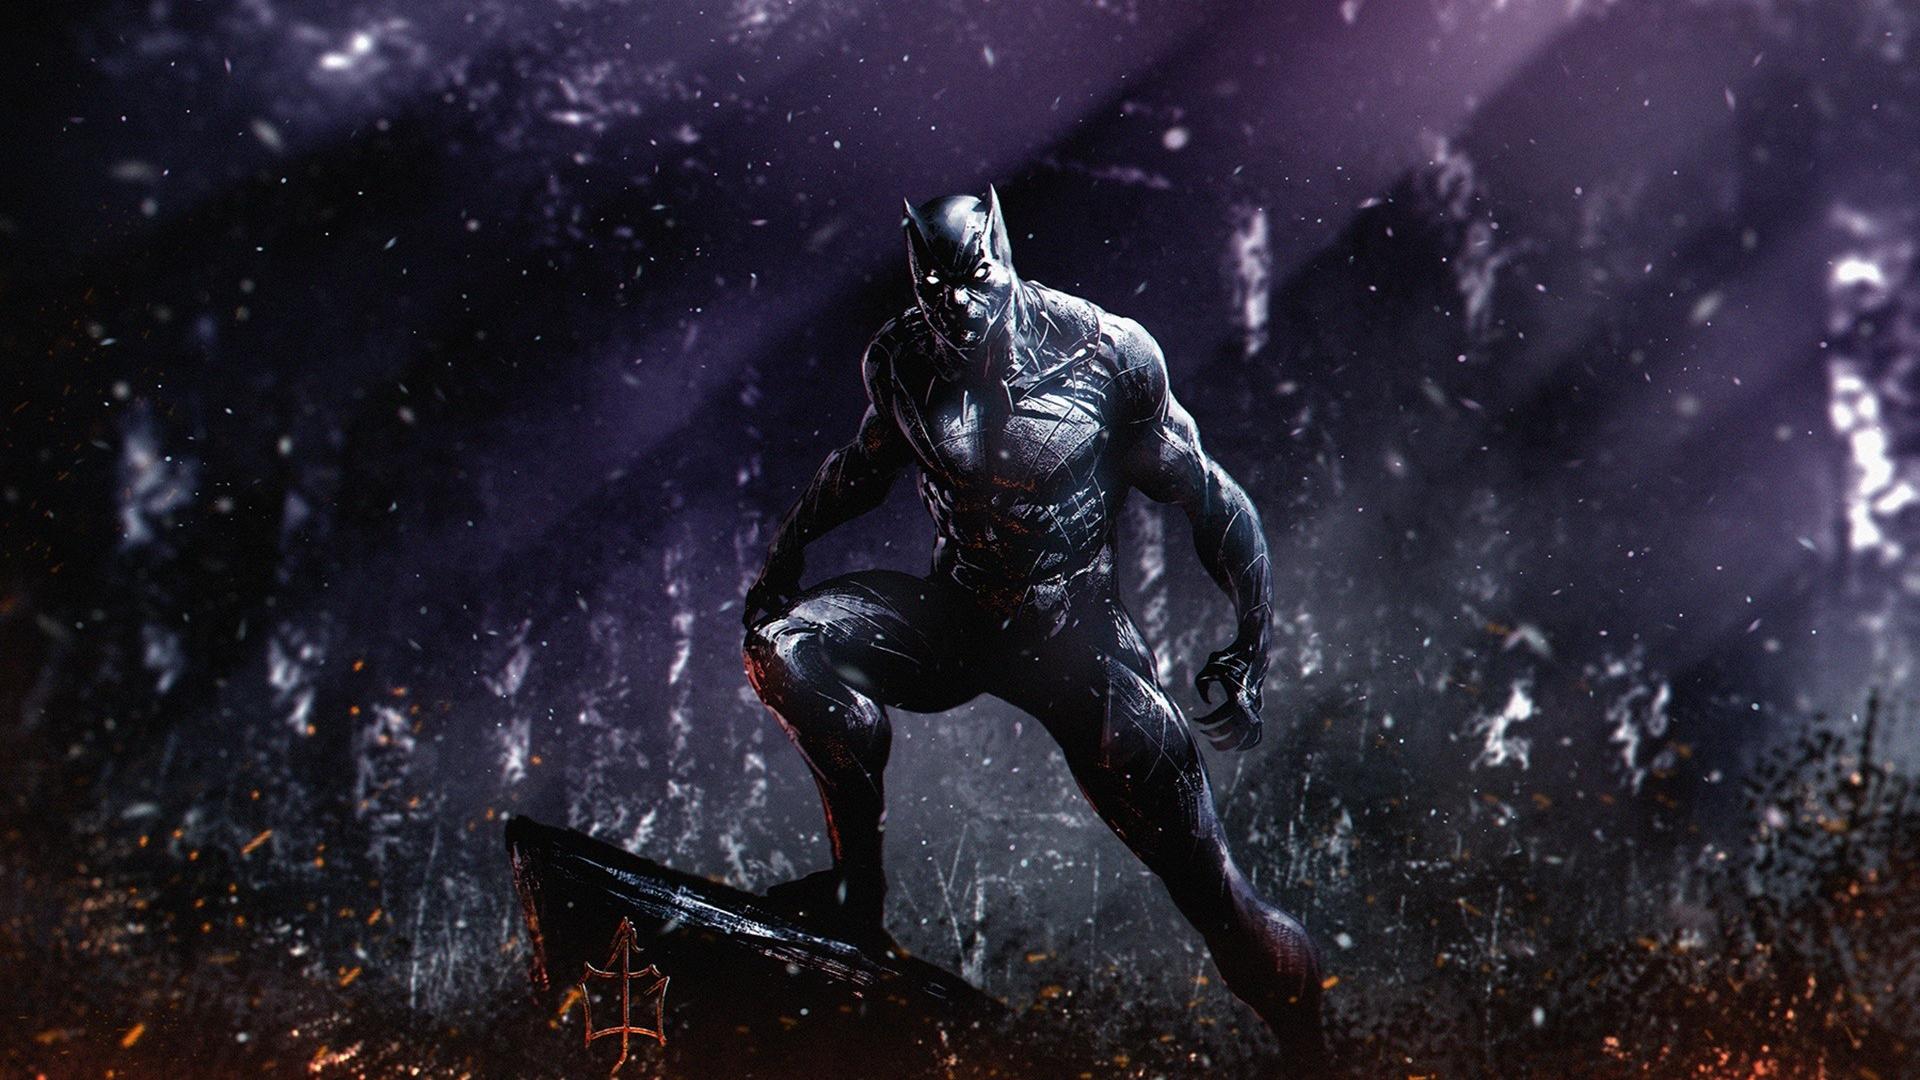 Download 1920x1080 Wallpaper Dark Superhero Marvel Black Panther